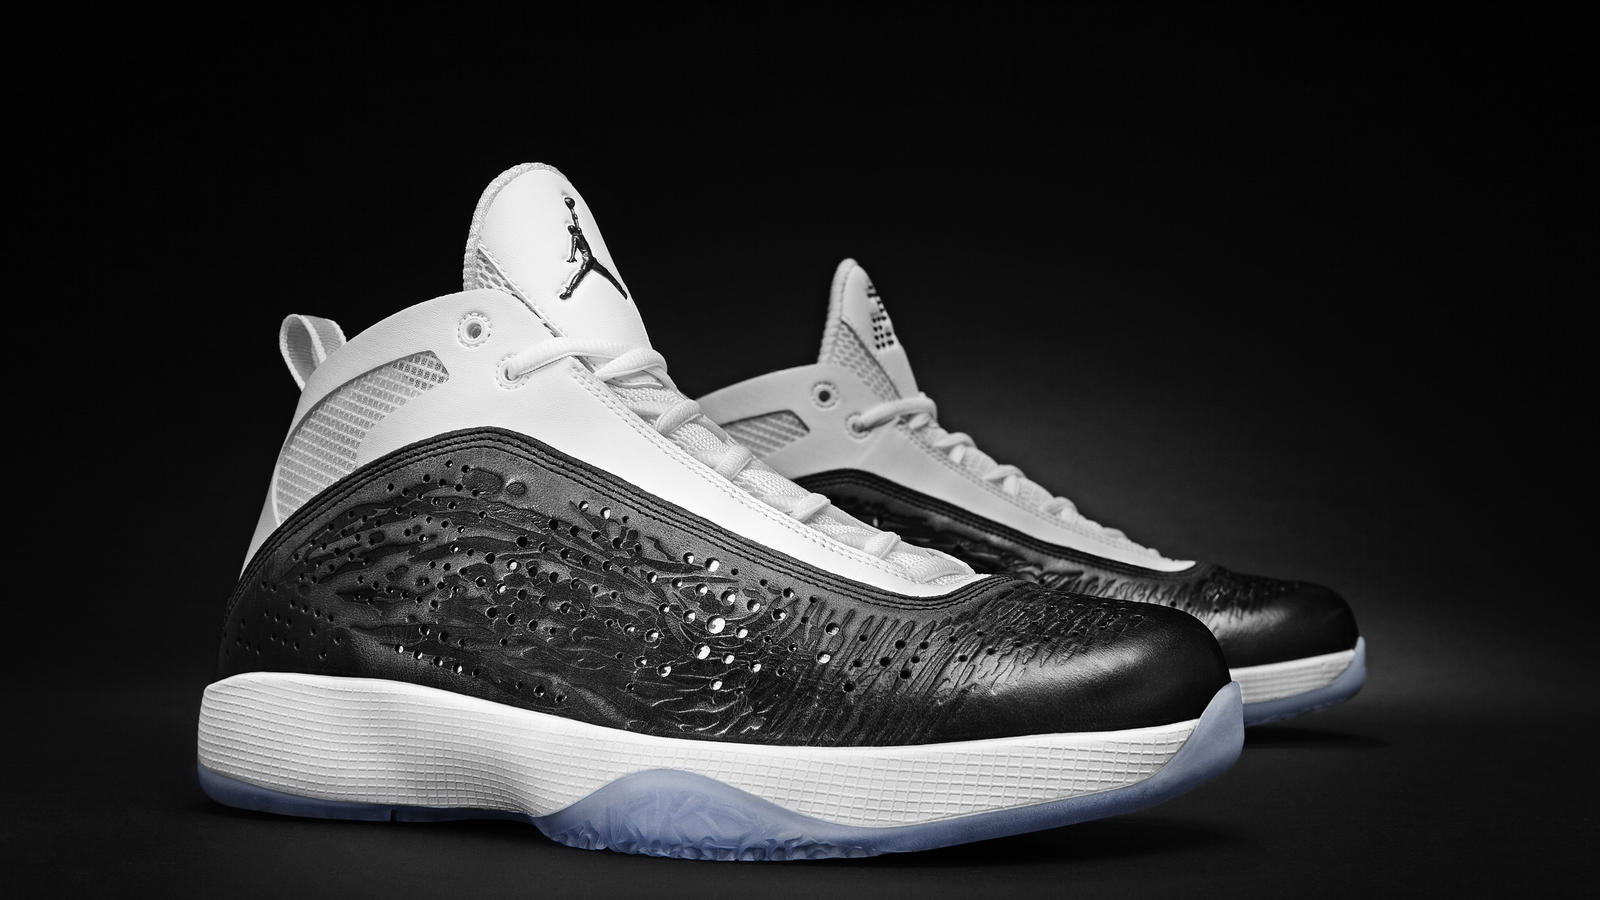 Jordan Brand Launches Air Jordan 2011